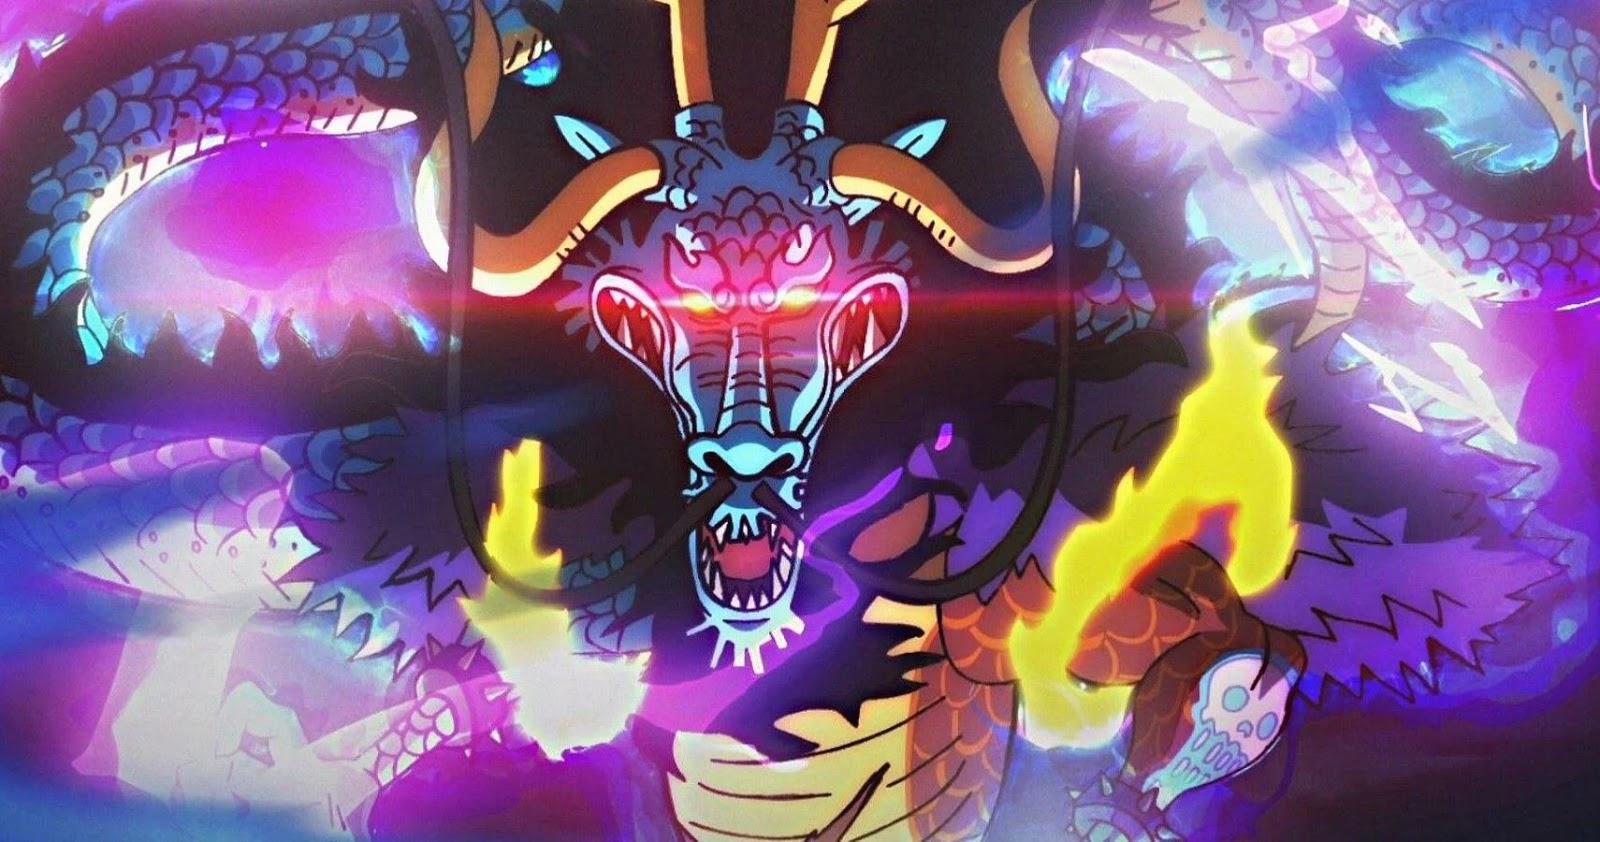 Oda Belum Tahu, Bagaimana Cara Mengalahkan Kaido!